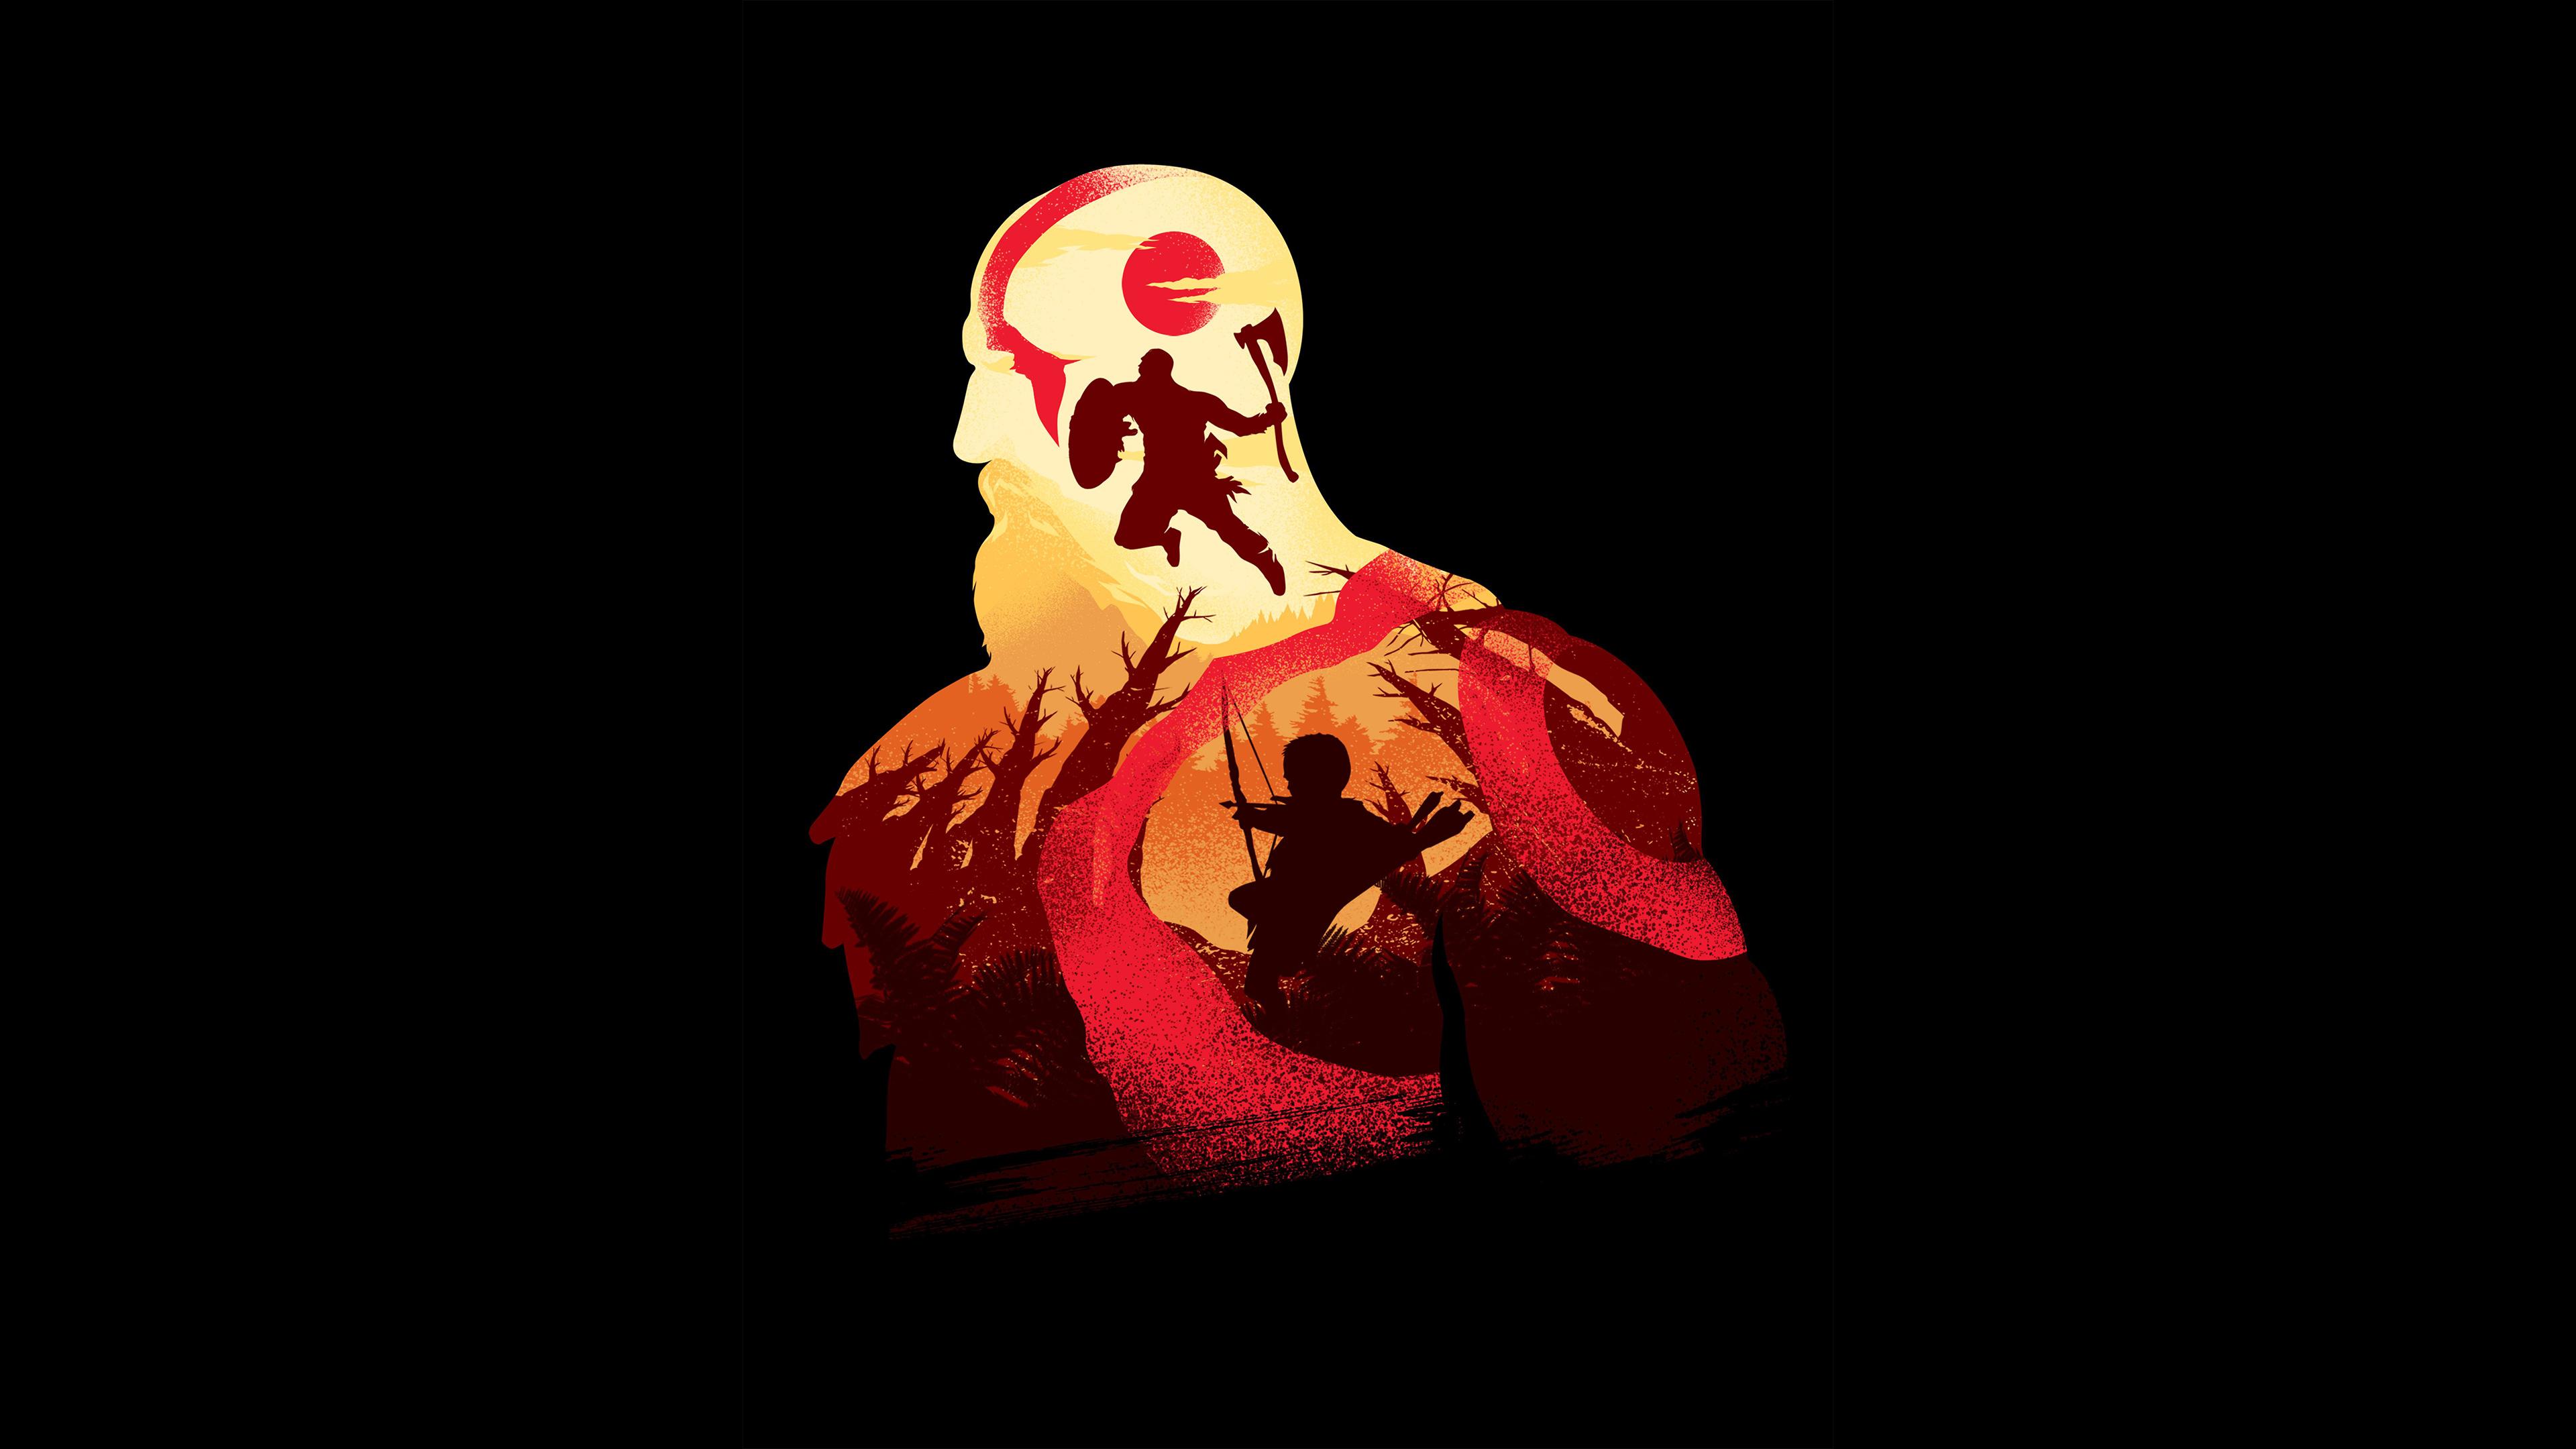 16 Luxury Pubg Wallpaper Iphone 6: 1080x1920 Kratos In God Of War 4K Minimalism Iphone 7,6s,6